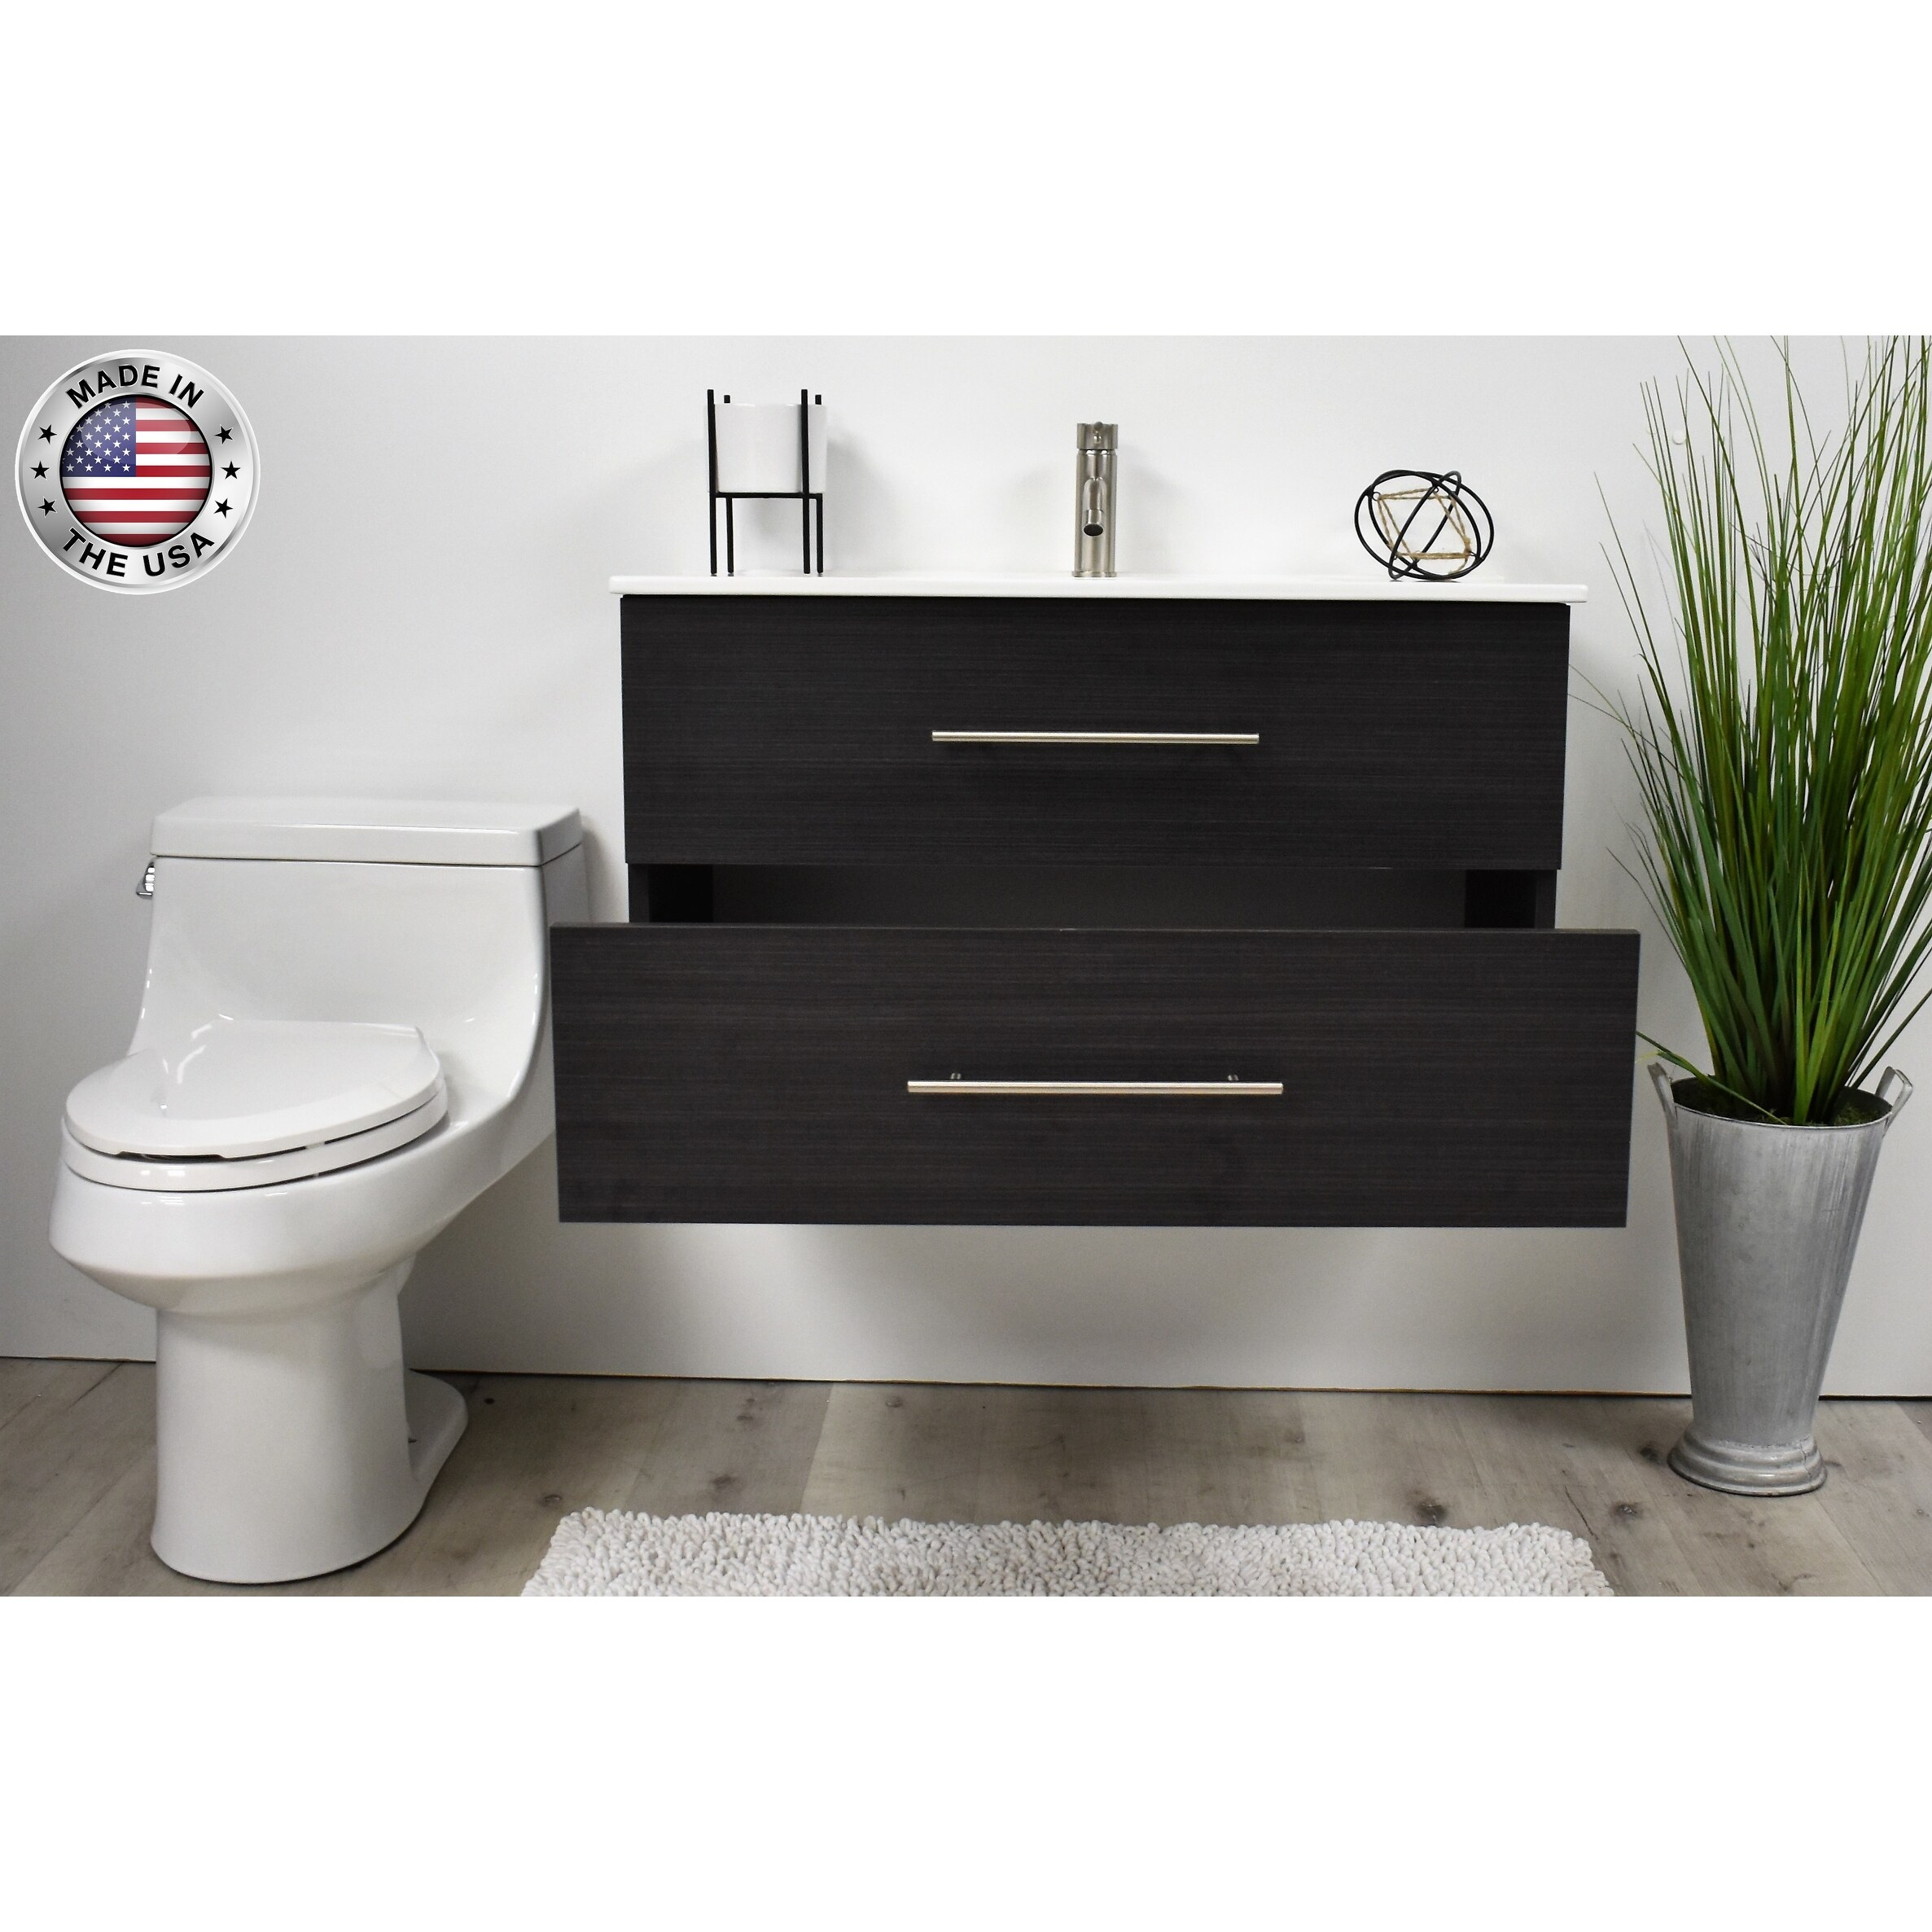 Volpa Usa Napa 30 Inch Black Ash Wall Mounted Floating Bathroom Vanity Set Overstock 32207305